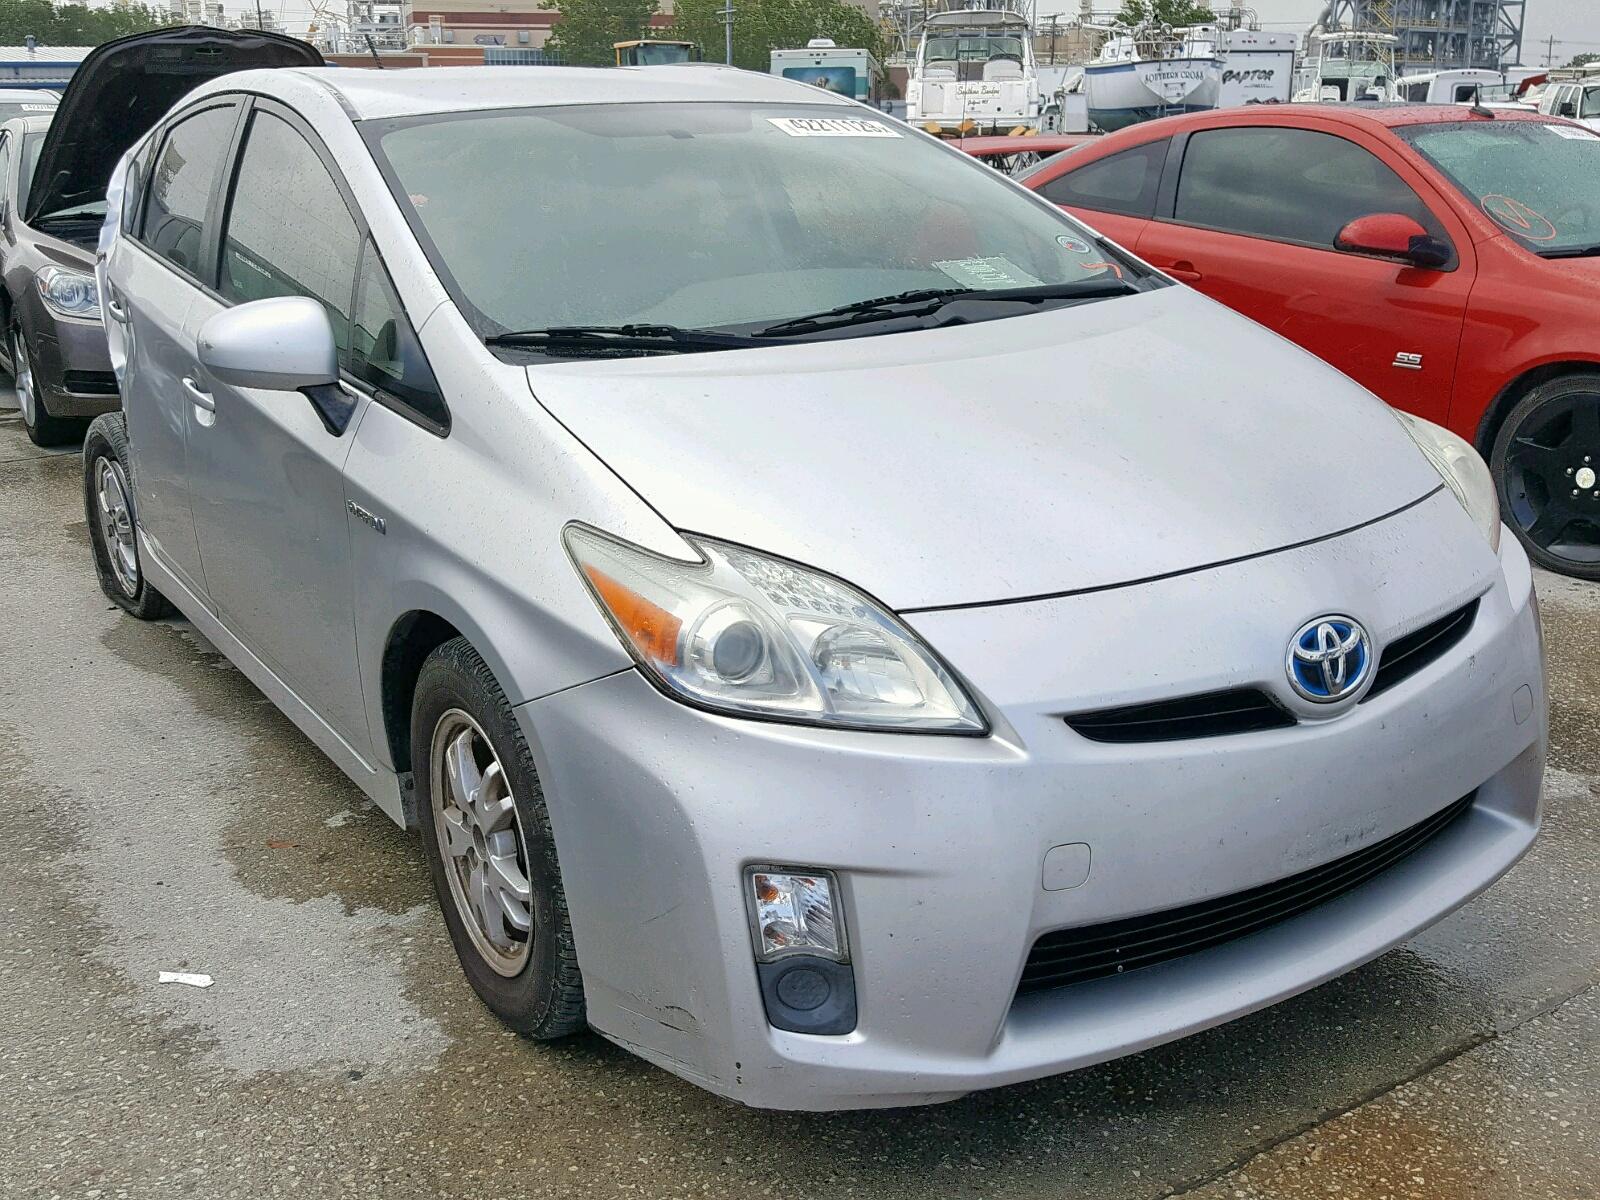 2010 Toyota Prius 1 8L 4 in LA - New Orleans